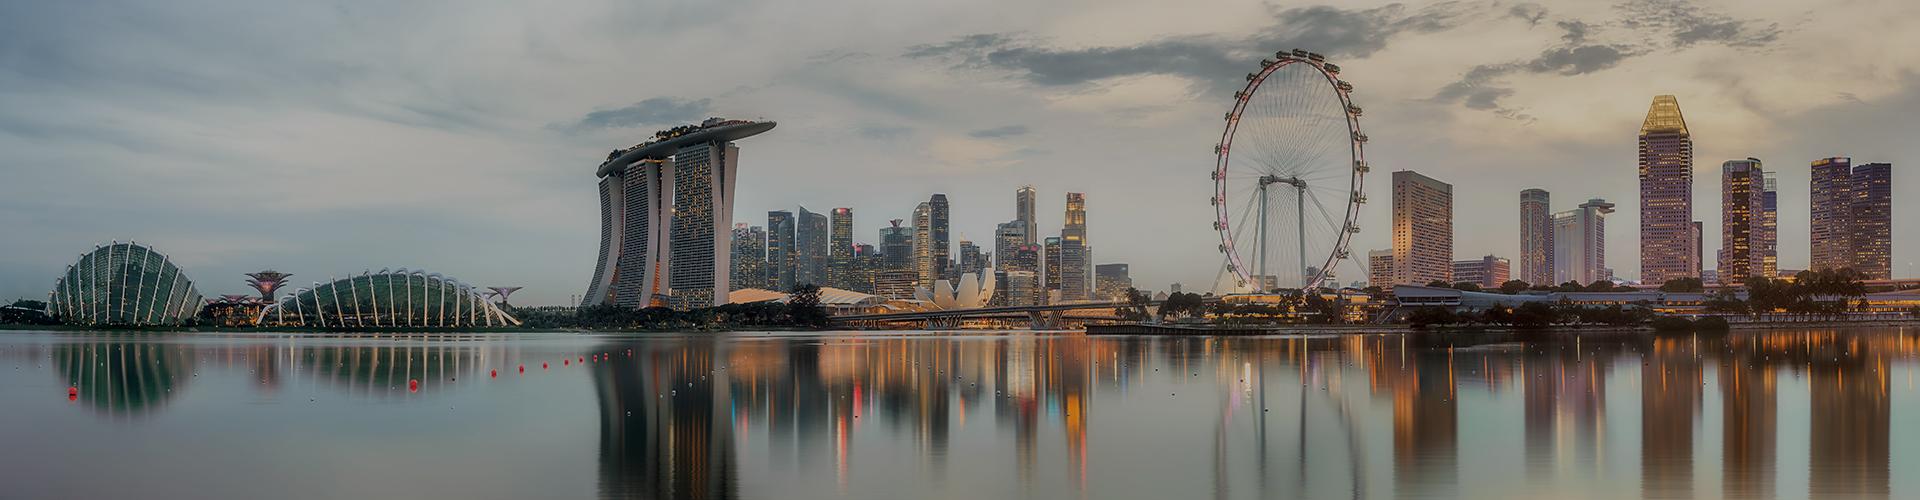 Landmark photograph of Singapore